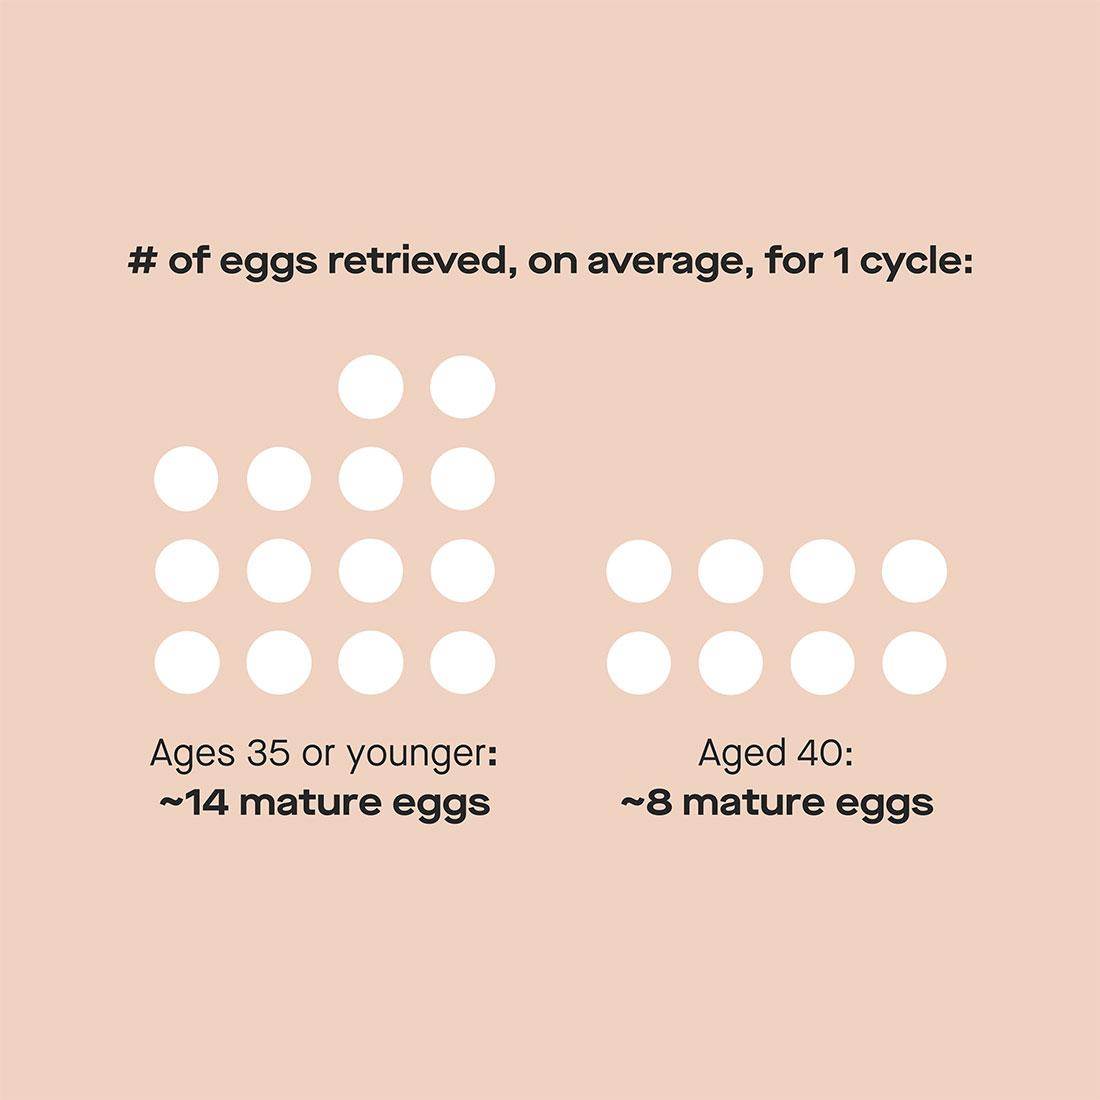 Number of eggs retrieved per cycle